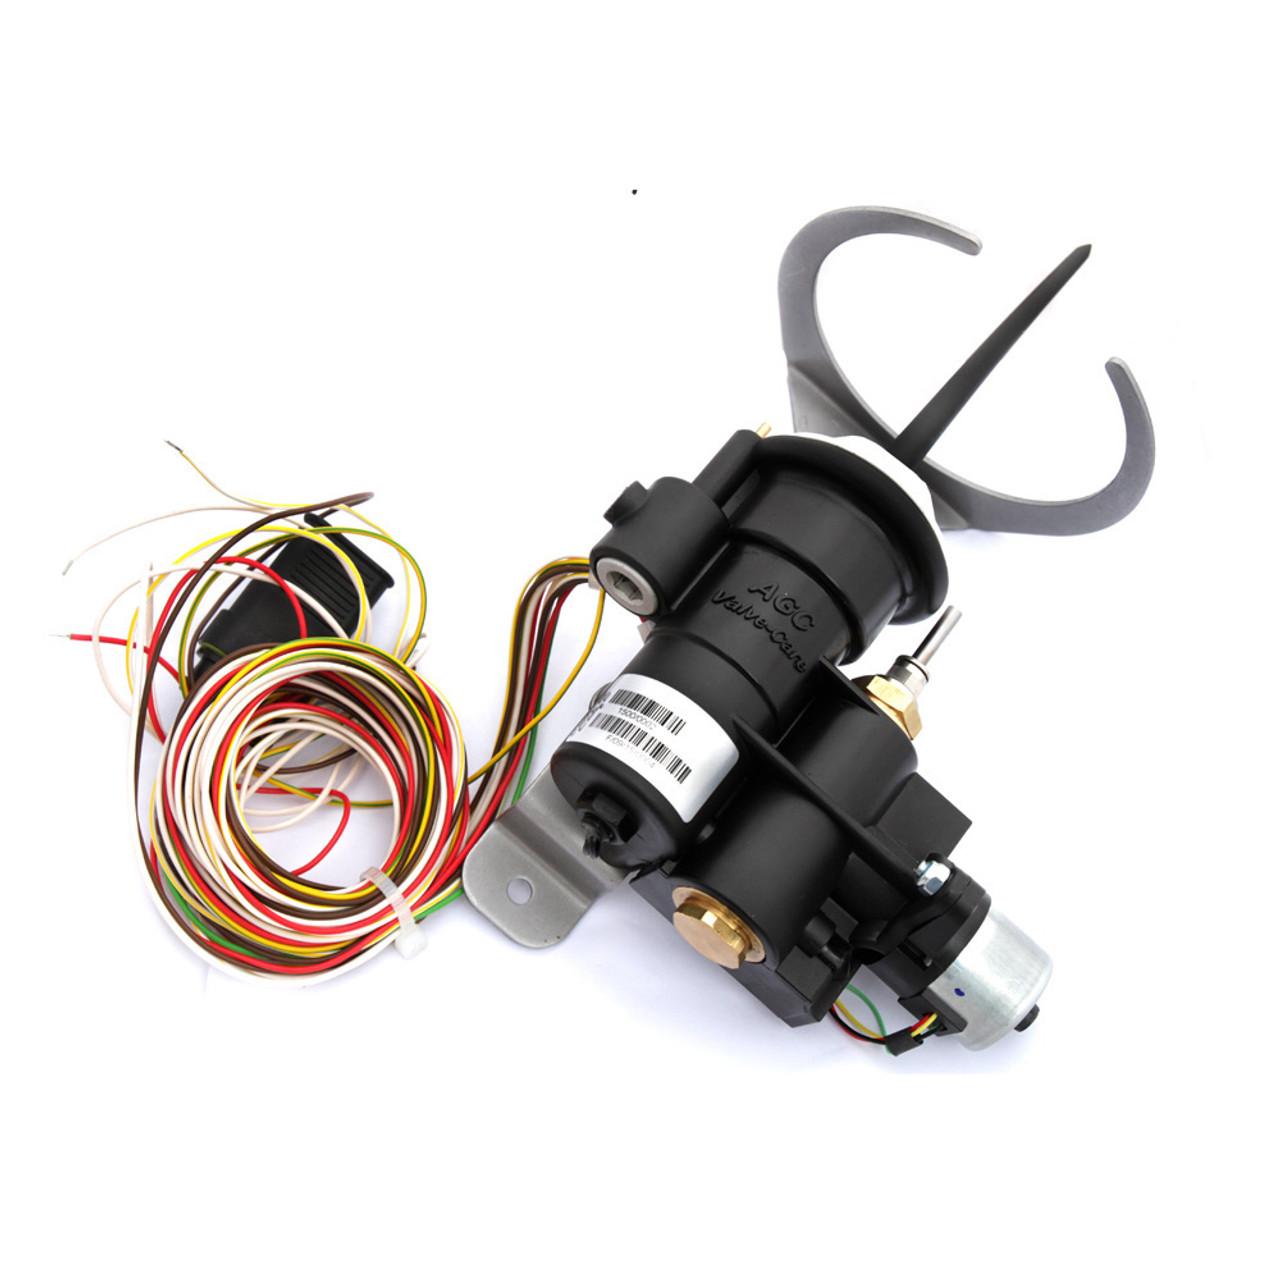 prins valvecare additive dosing system lpg cng valve protection